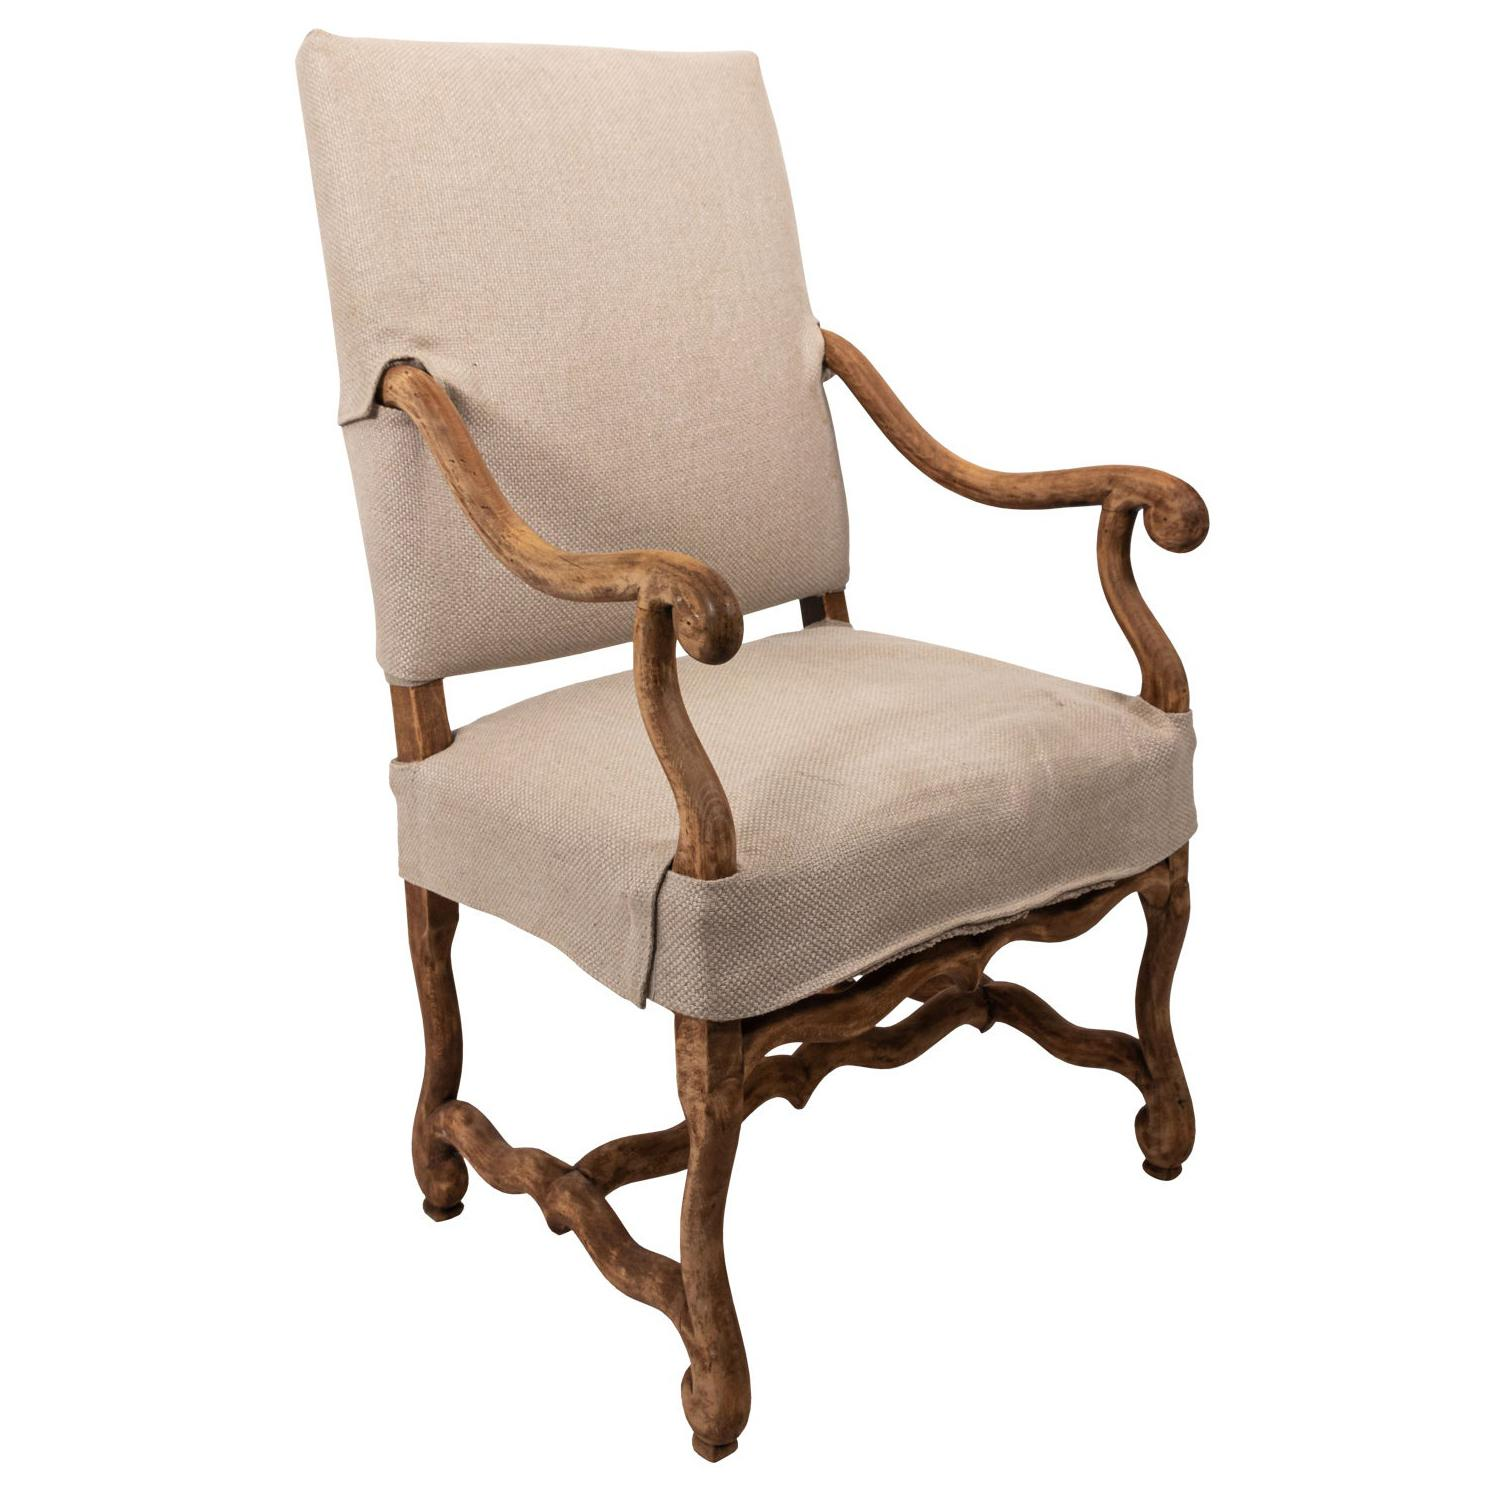 French Style Os De Mouton Armchair